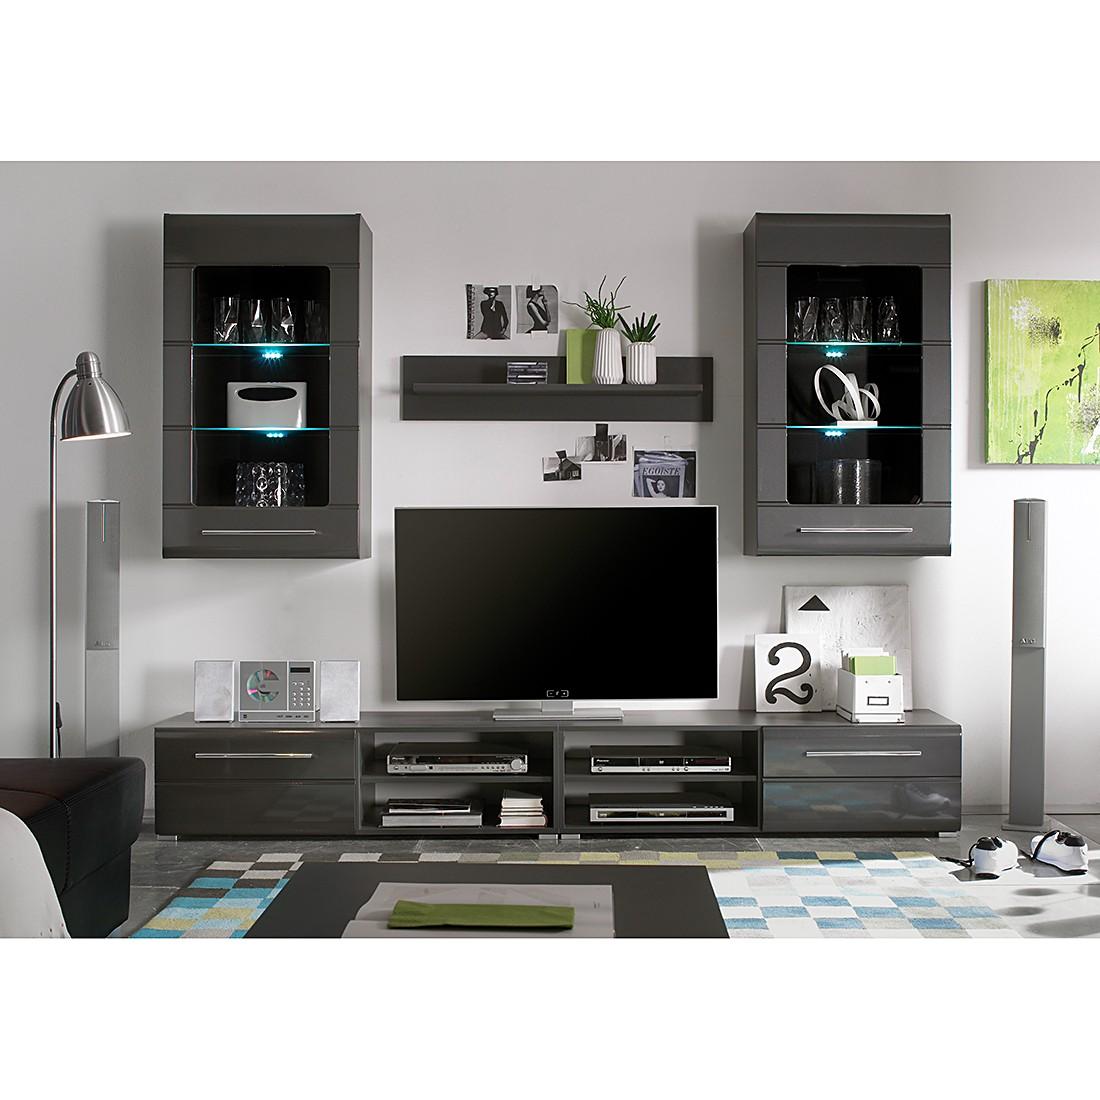 wohnwand tadeus ii 4 teilig inkl beleuchtung. Black Bedroom Furniture Sets. Home Design Ideas